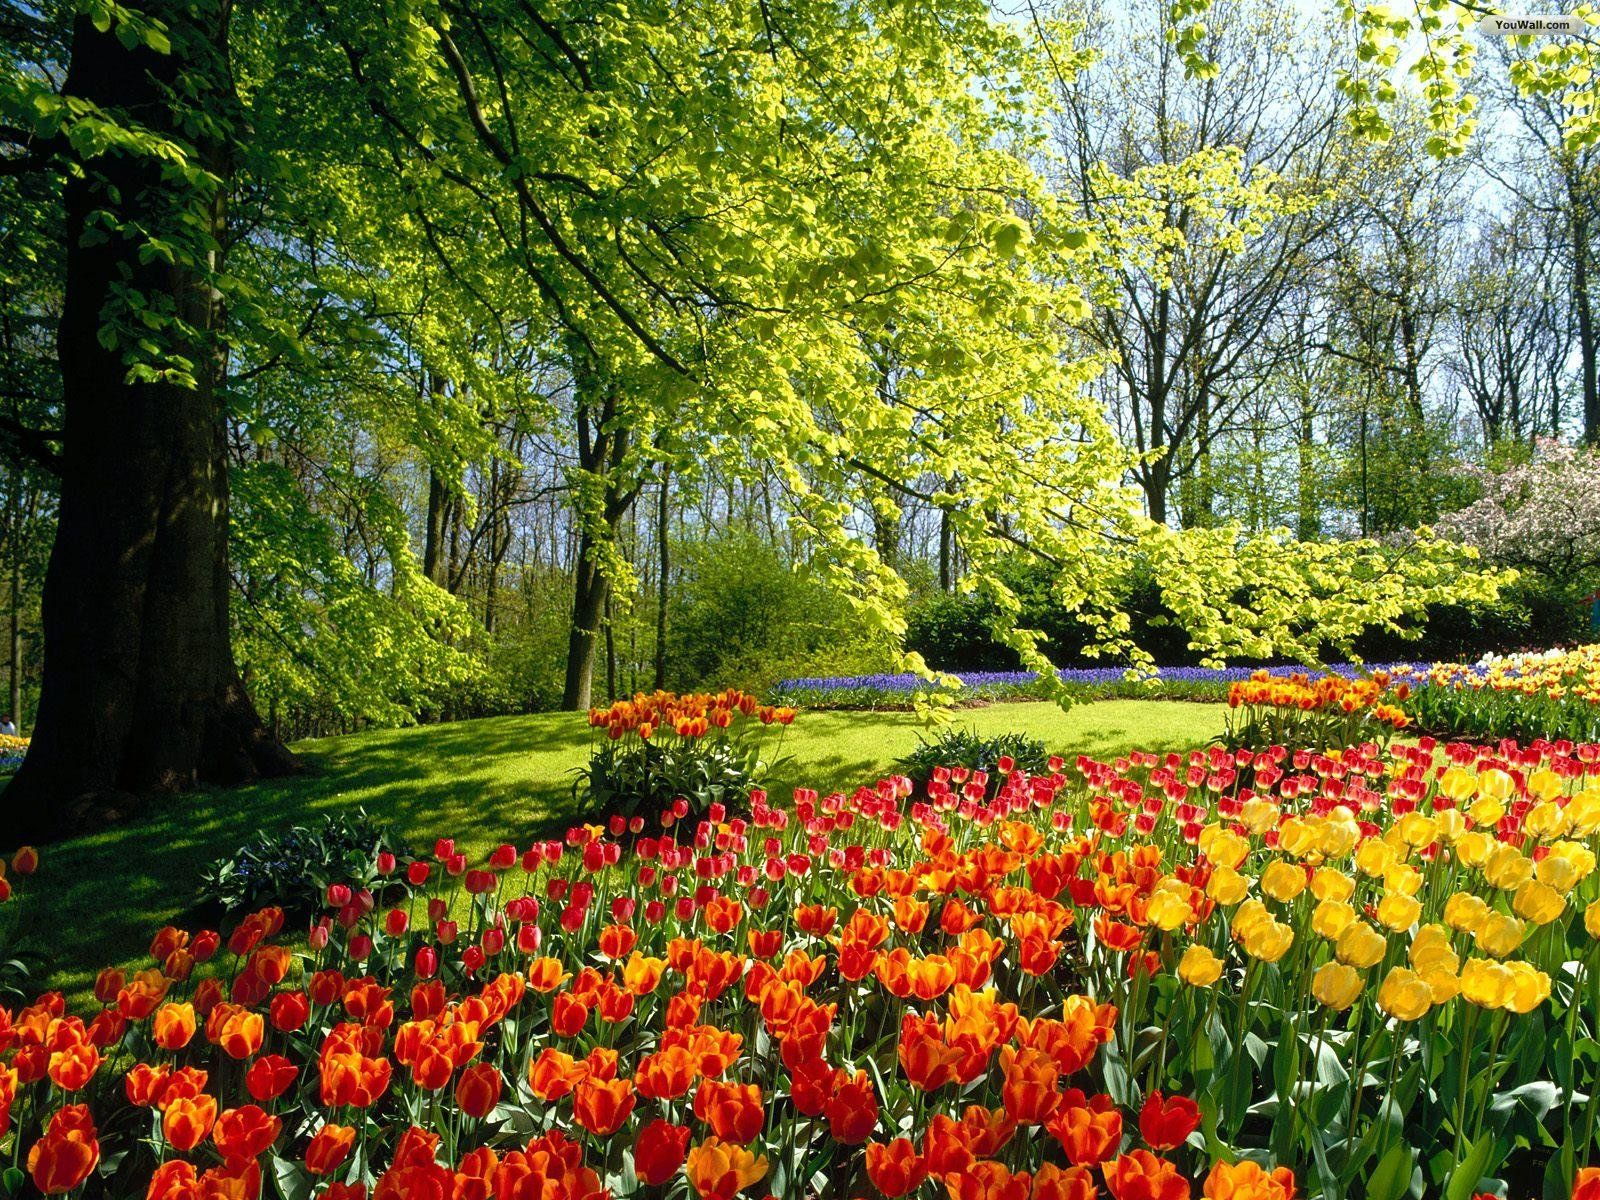 Image Detail For Beautiful Flower Garden Wallpapers Beautiful - Colorful flower garden background